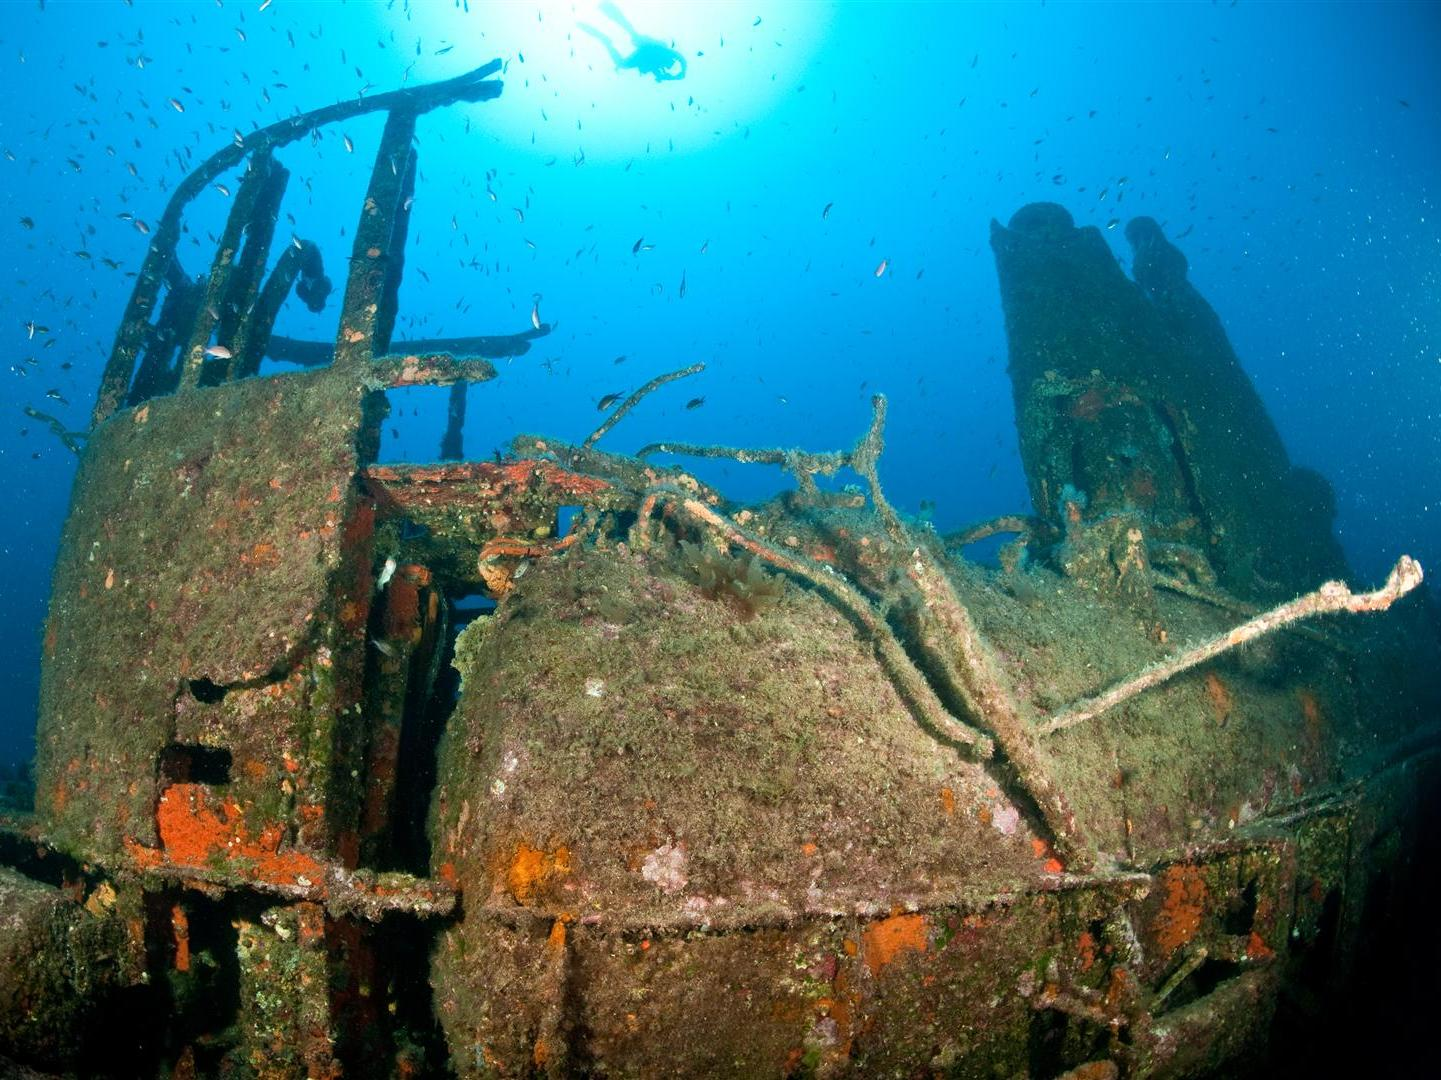 Sattler JuergenDSC 4391 - European Diving School